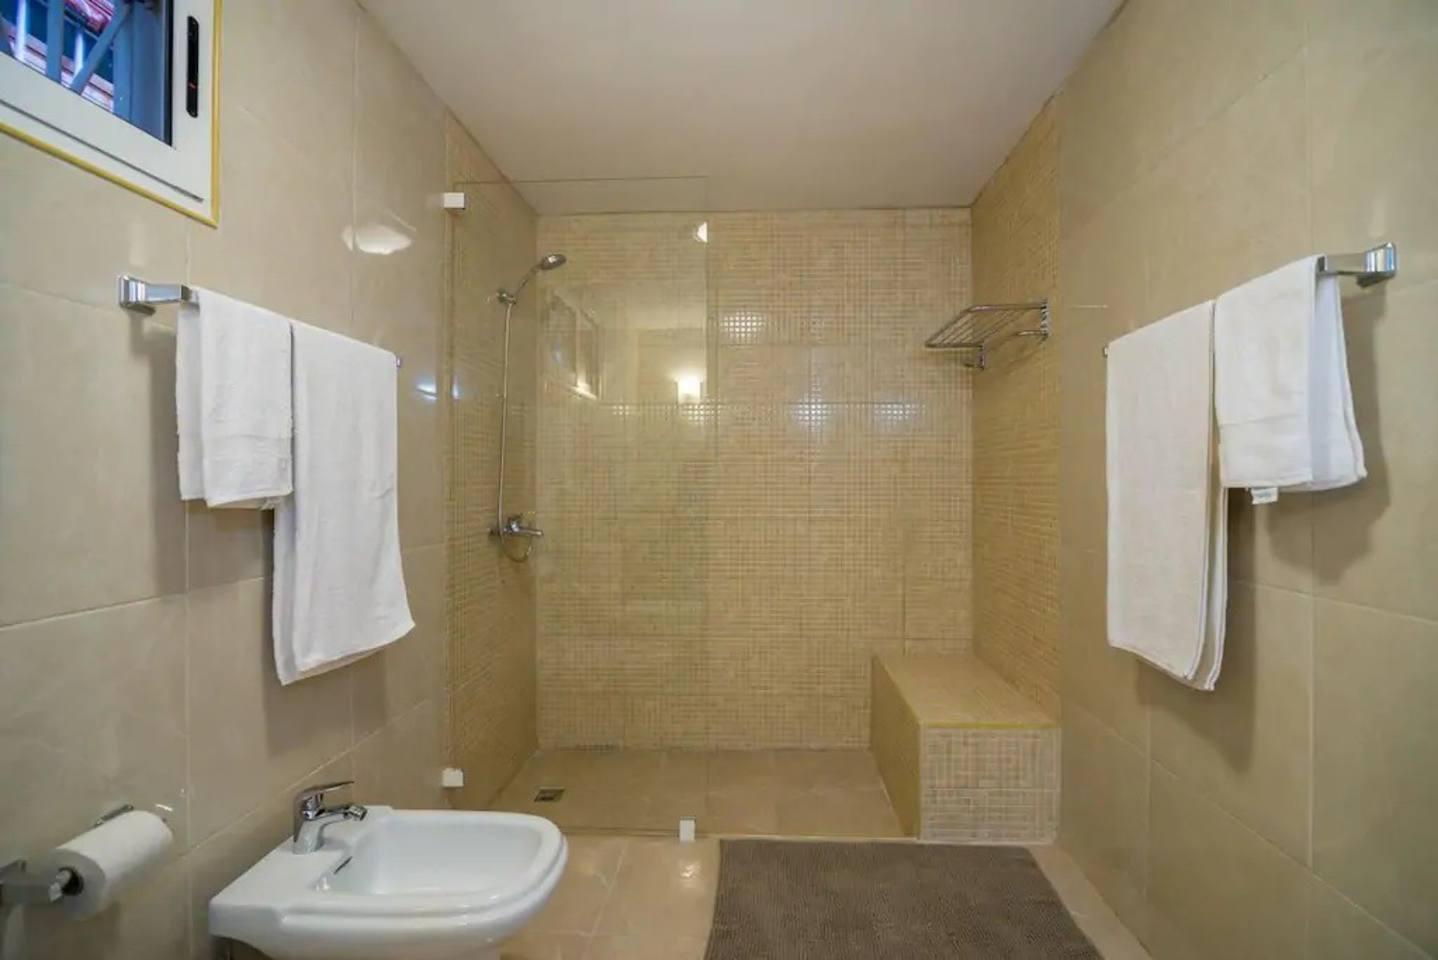 Apartment Villa Don Teto Suite   8 Rooms  Great Havana View photo 16816183